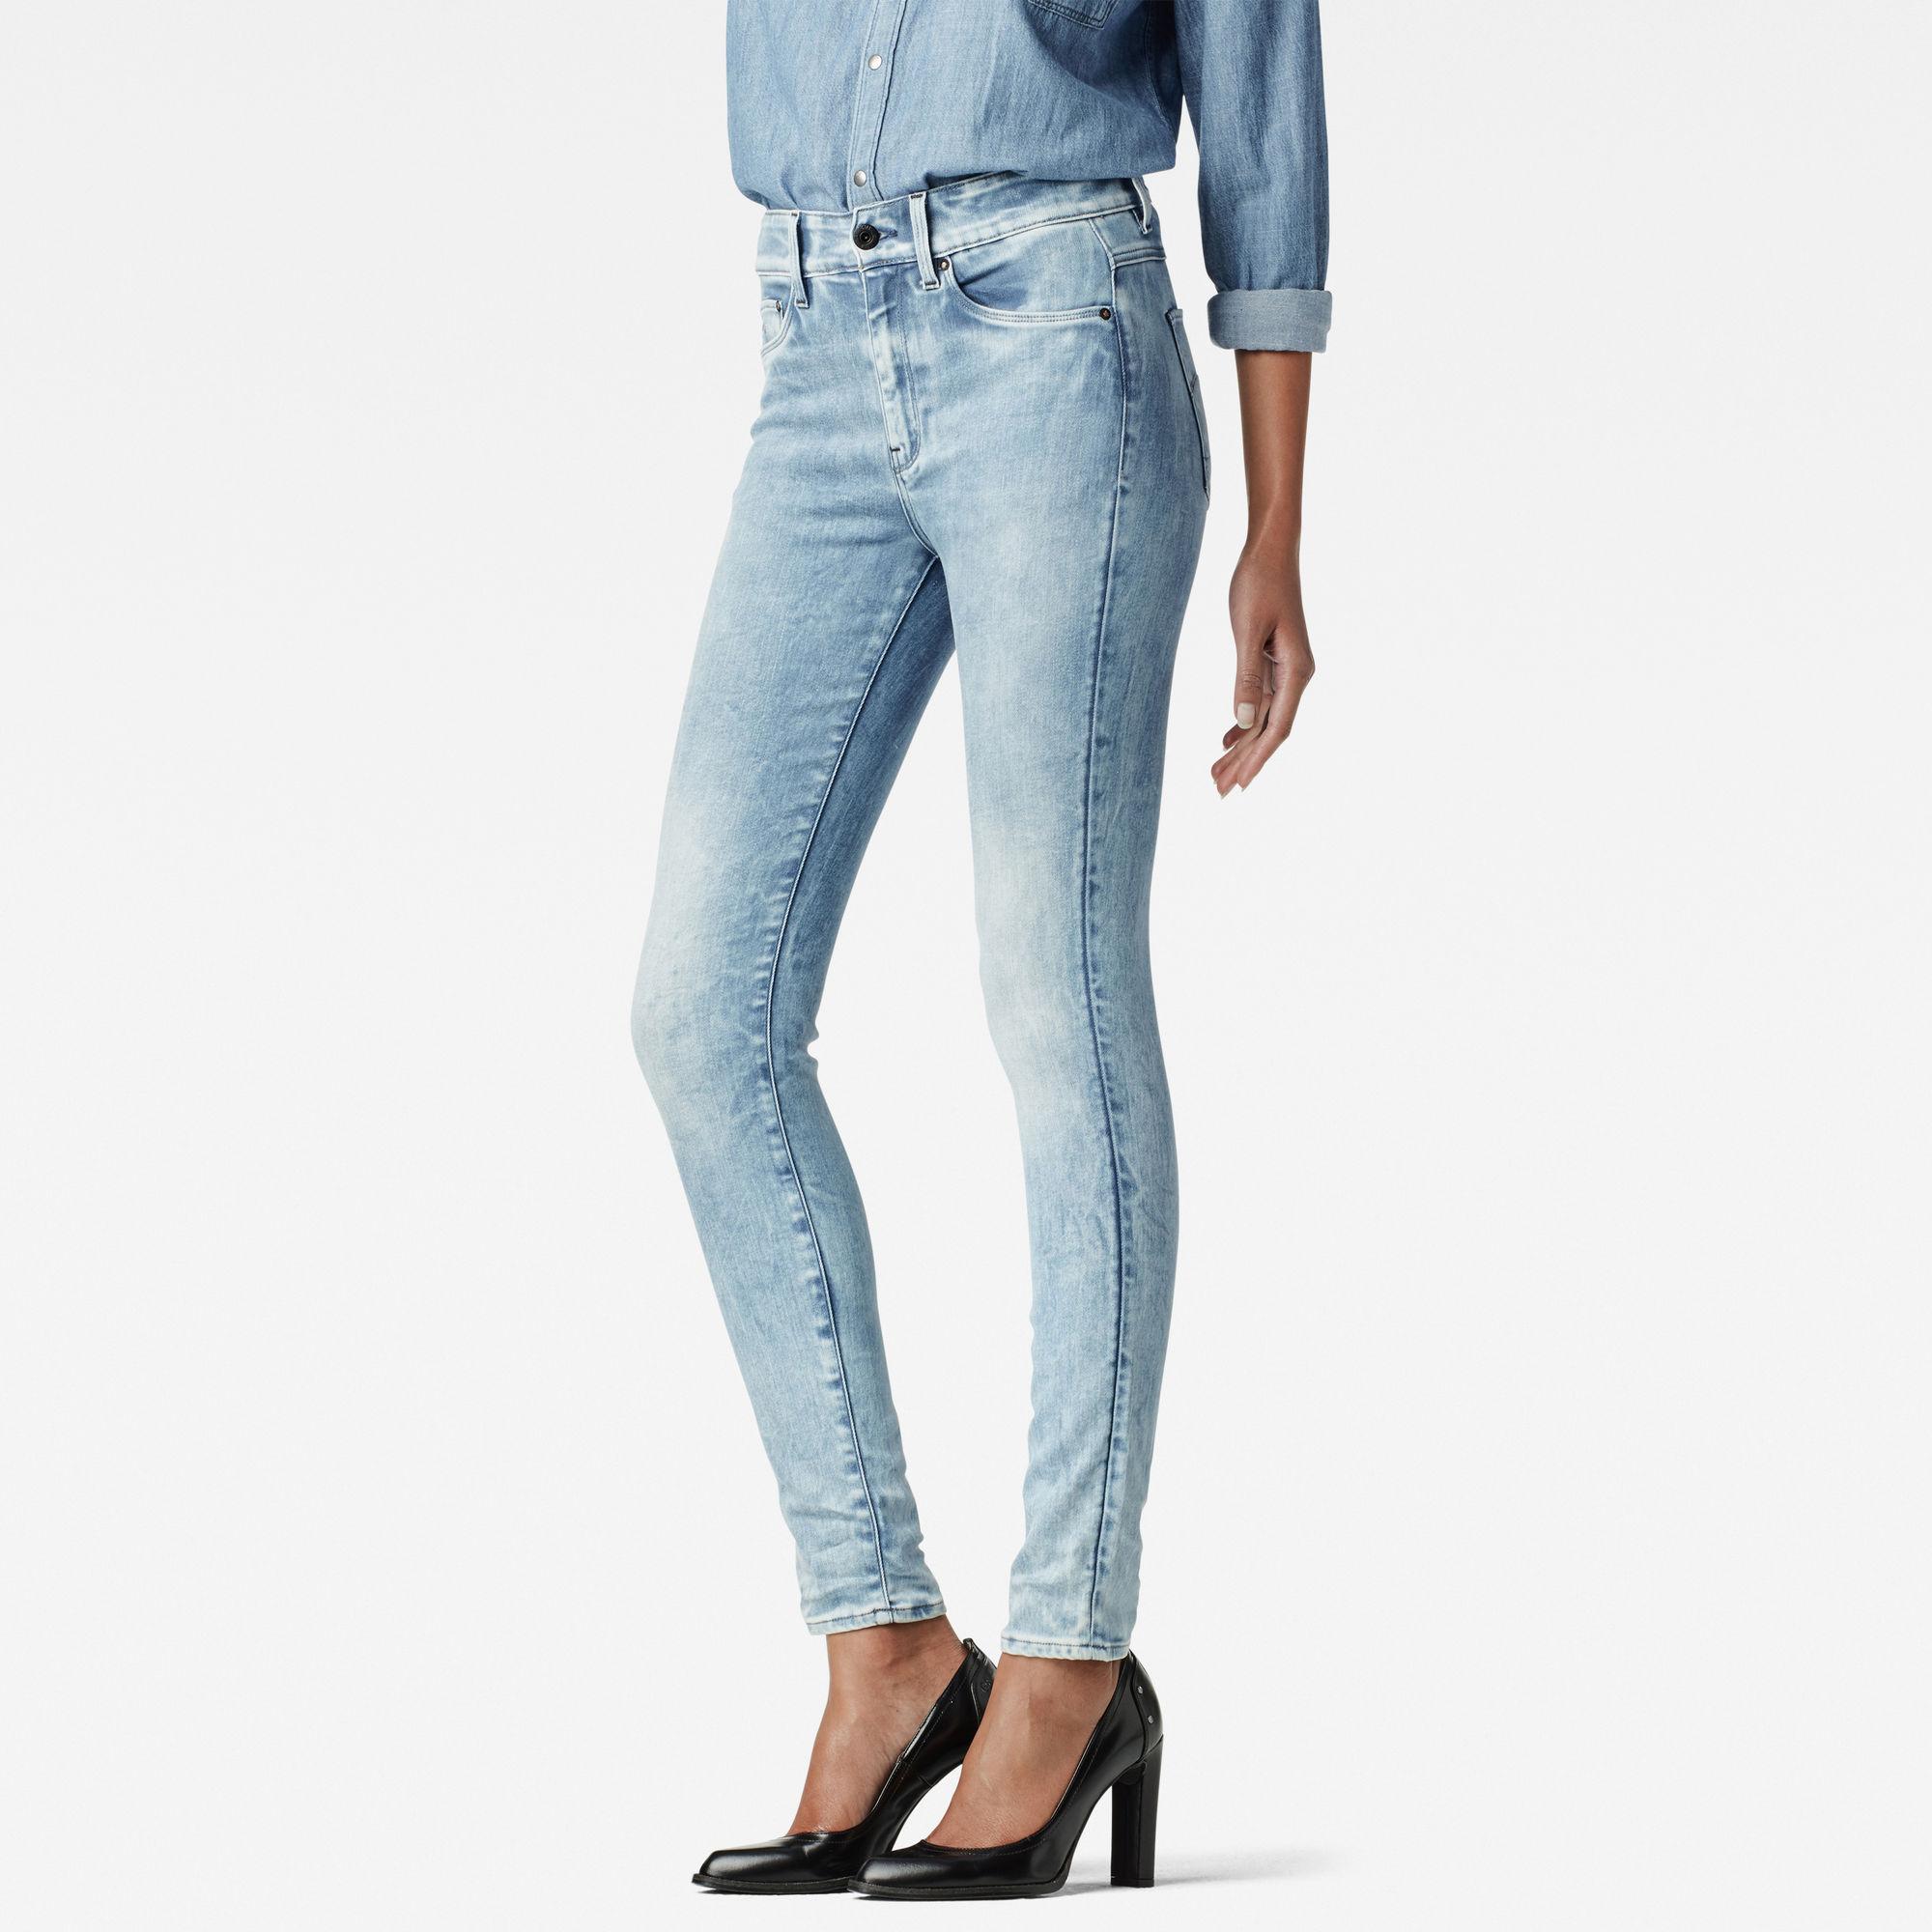 3301 Ultra High Waist Super Skinny Jeans